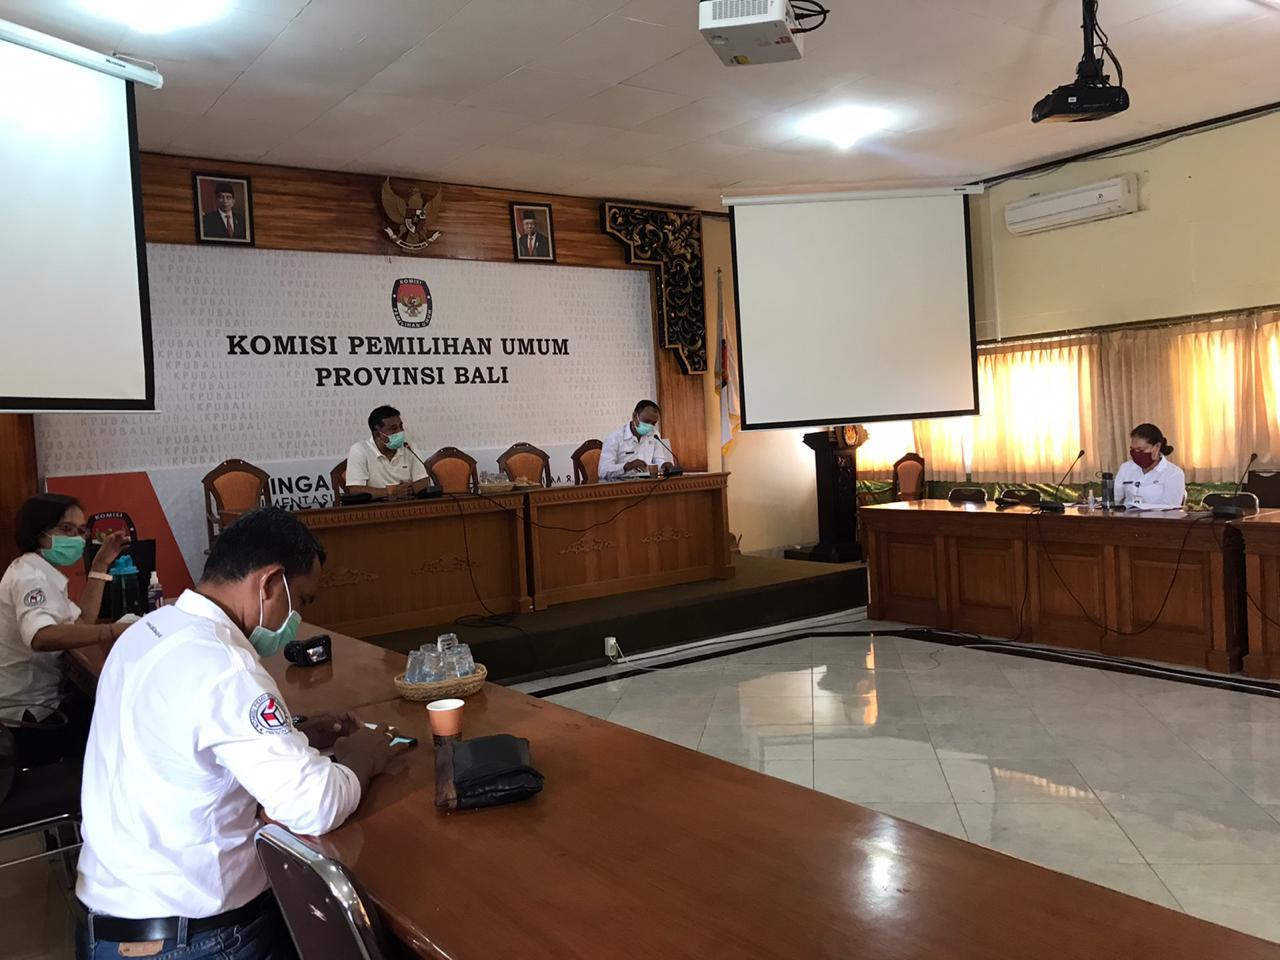 RAPAT pleno KPU Bali dengan menerapkan penjarakan fisik, Senin (6/4/2020). Foto: Ist